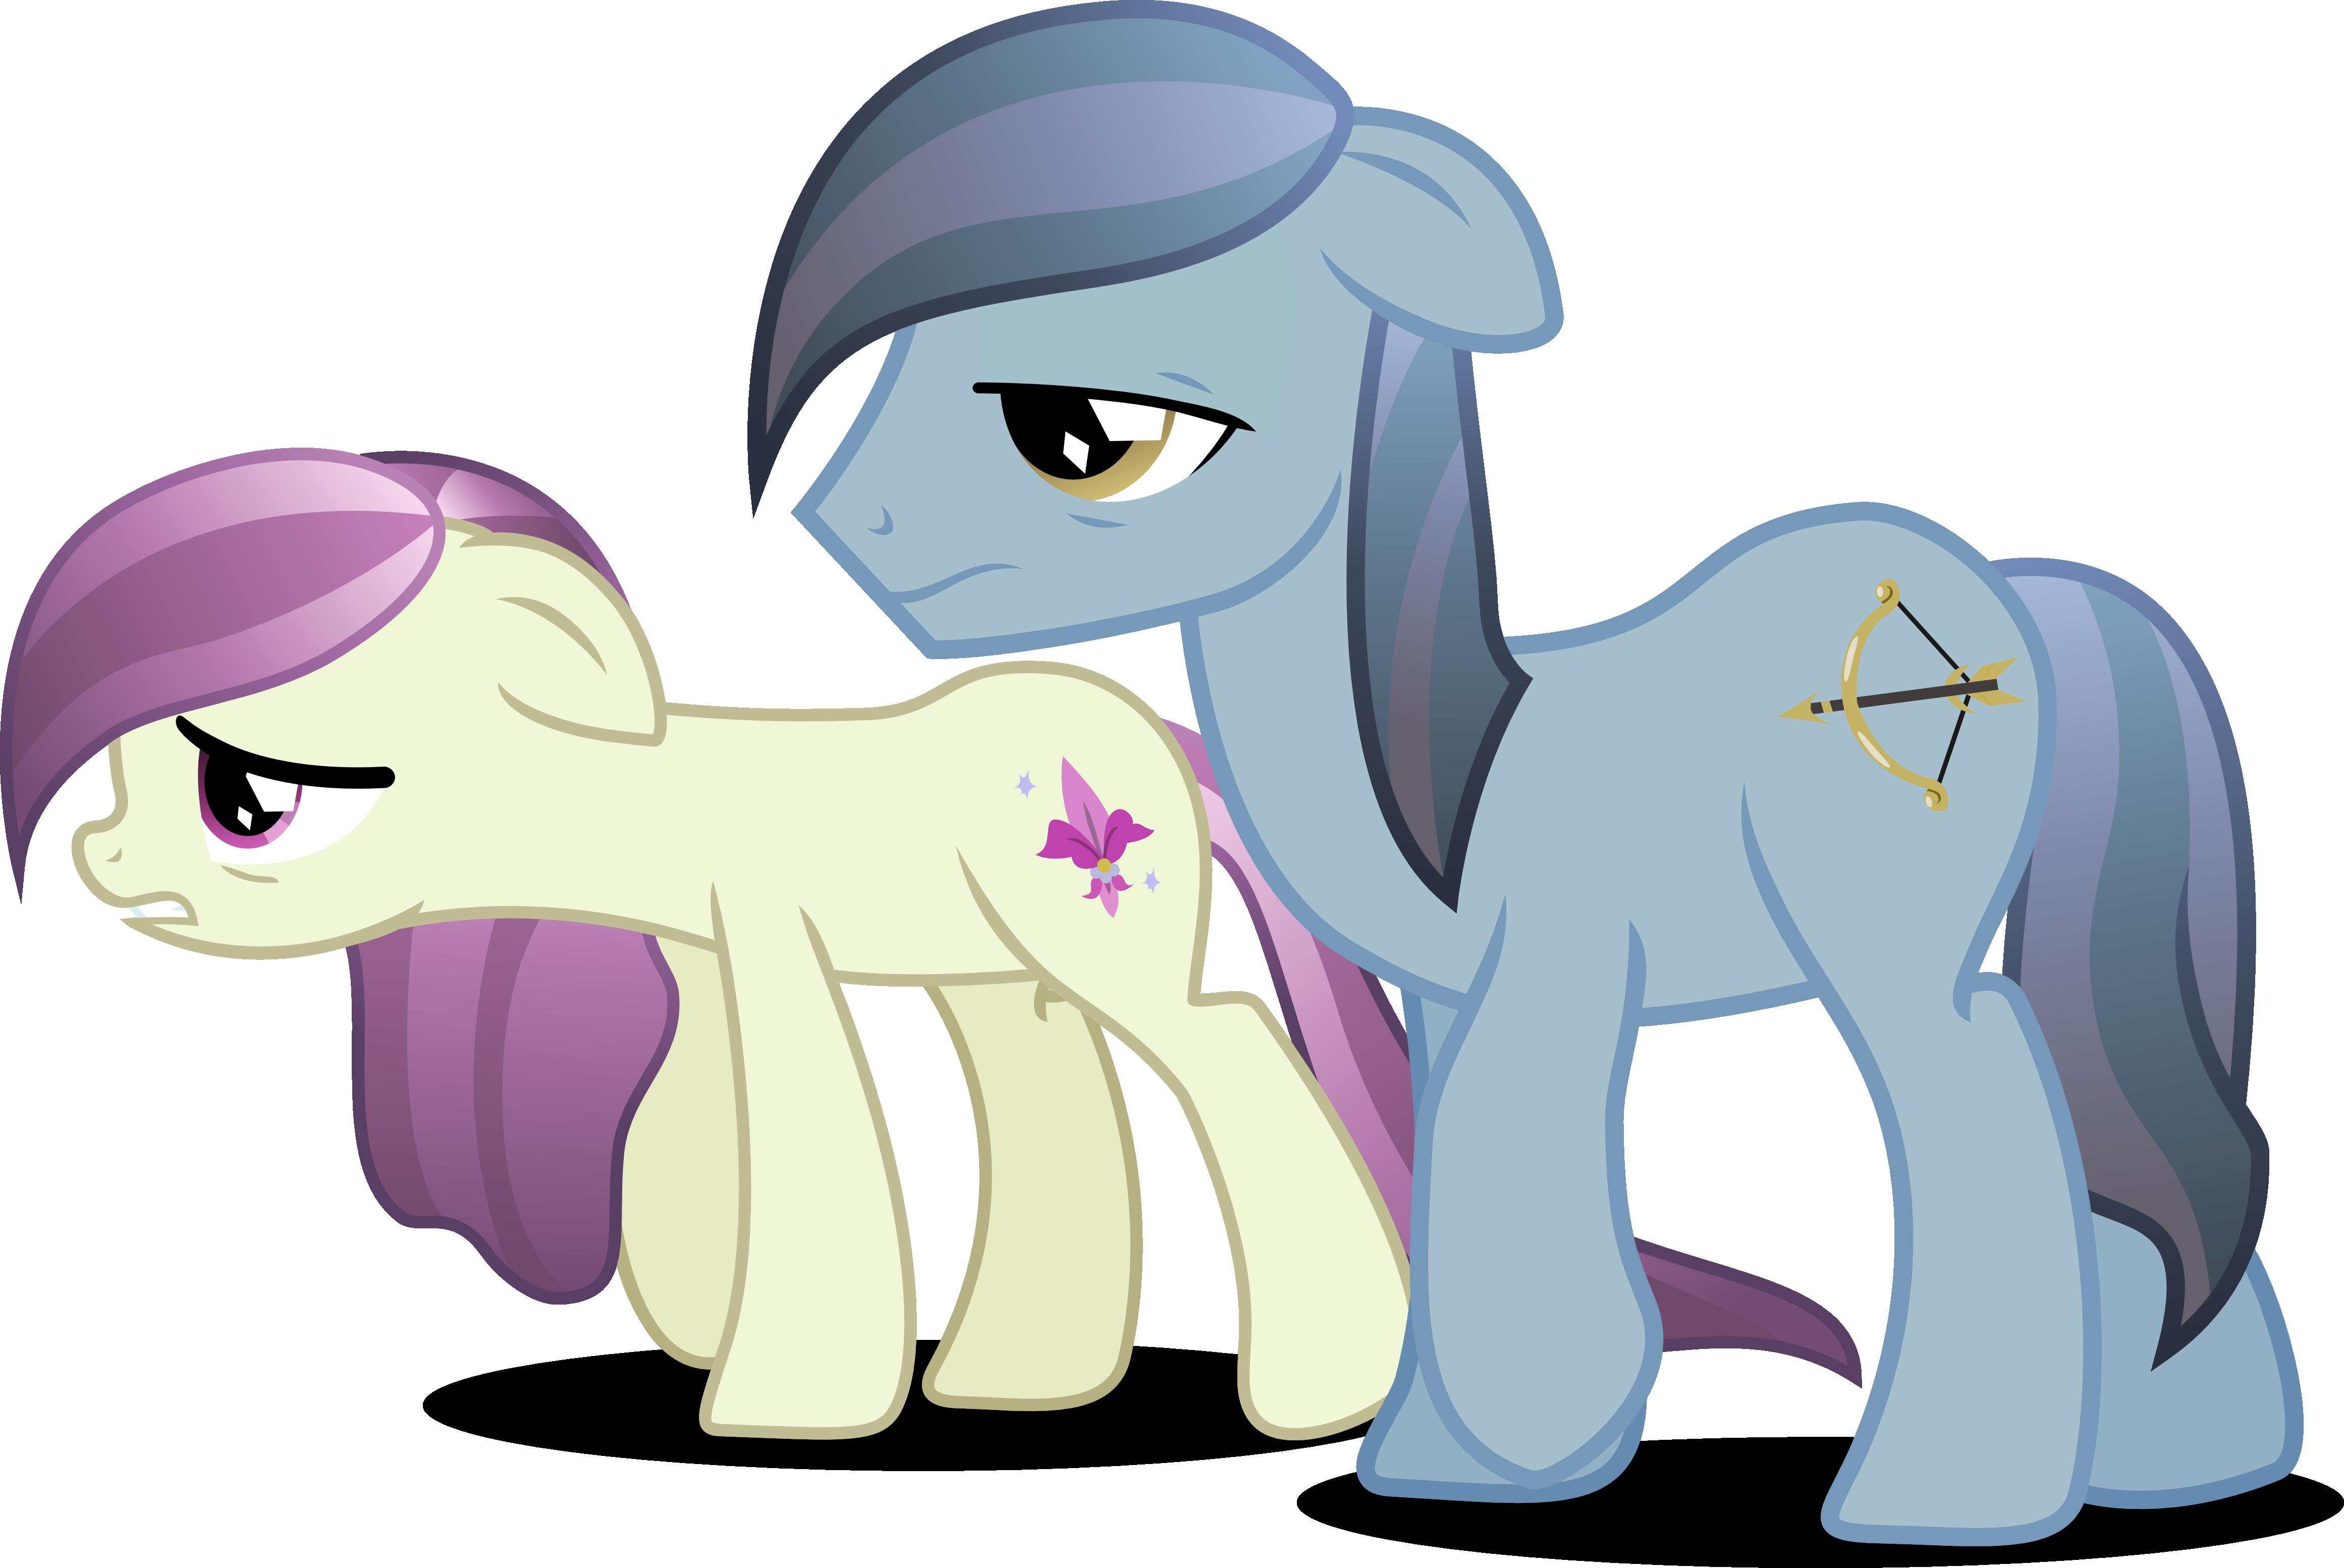 Depressed Crystal ponies by Vector-Brony on DeviantArt